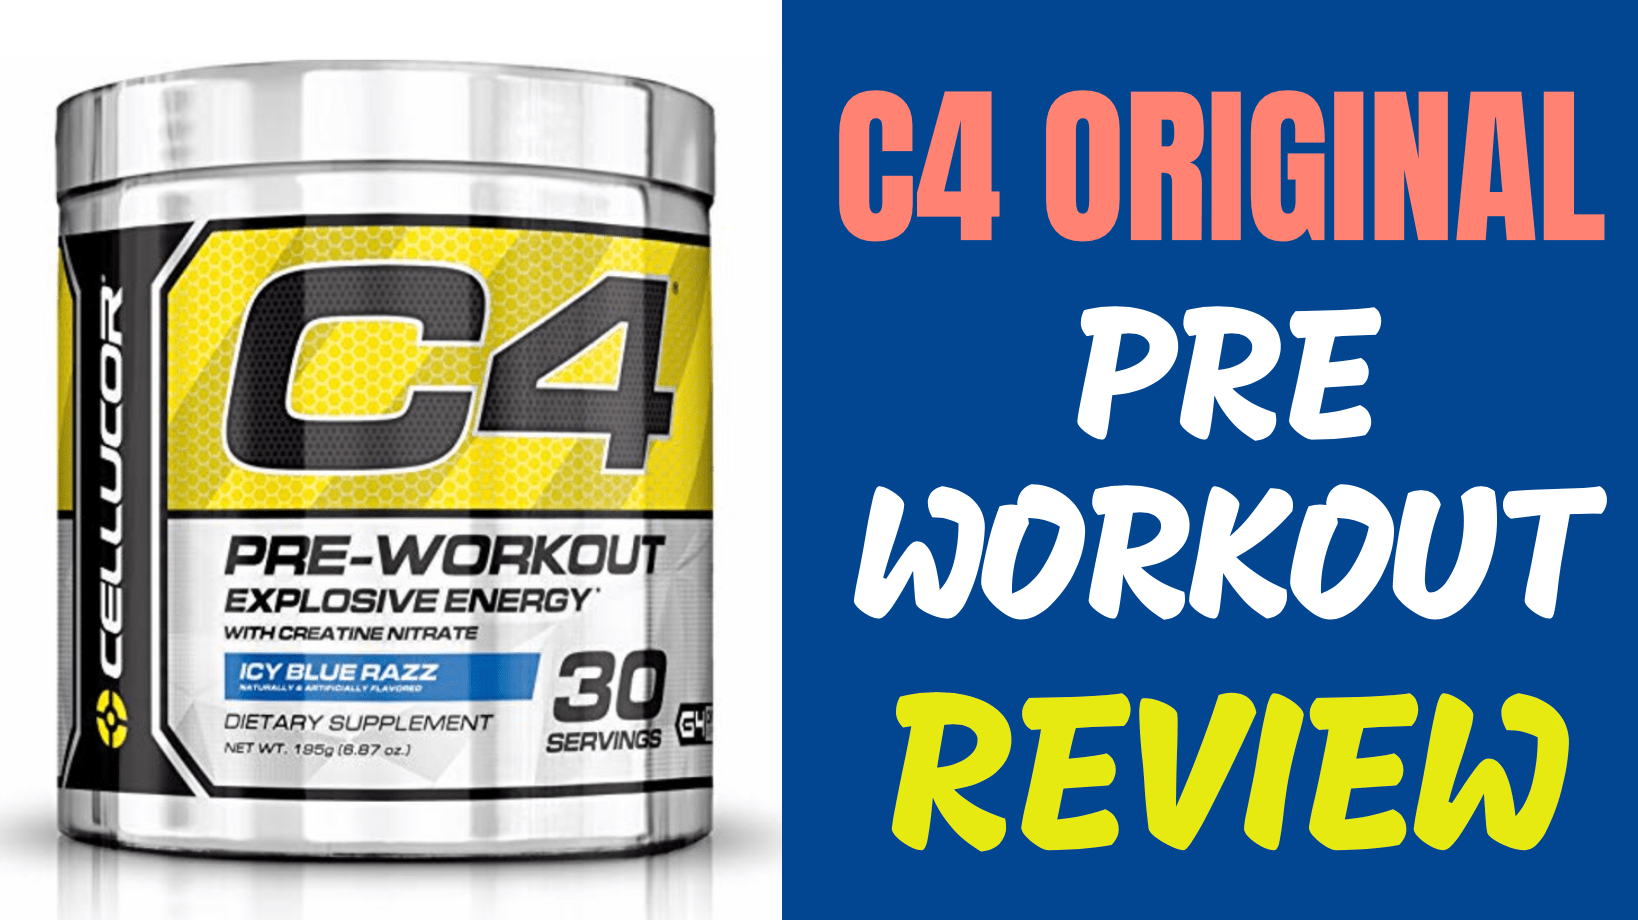 C4 pre workout clipart clipart royalty free download Cellucor C4 Original Pre Workout Review - HeavyLiftz clipart royalty free download